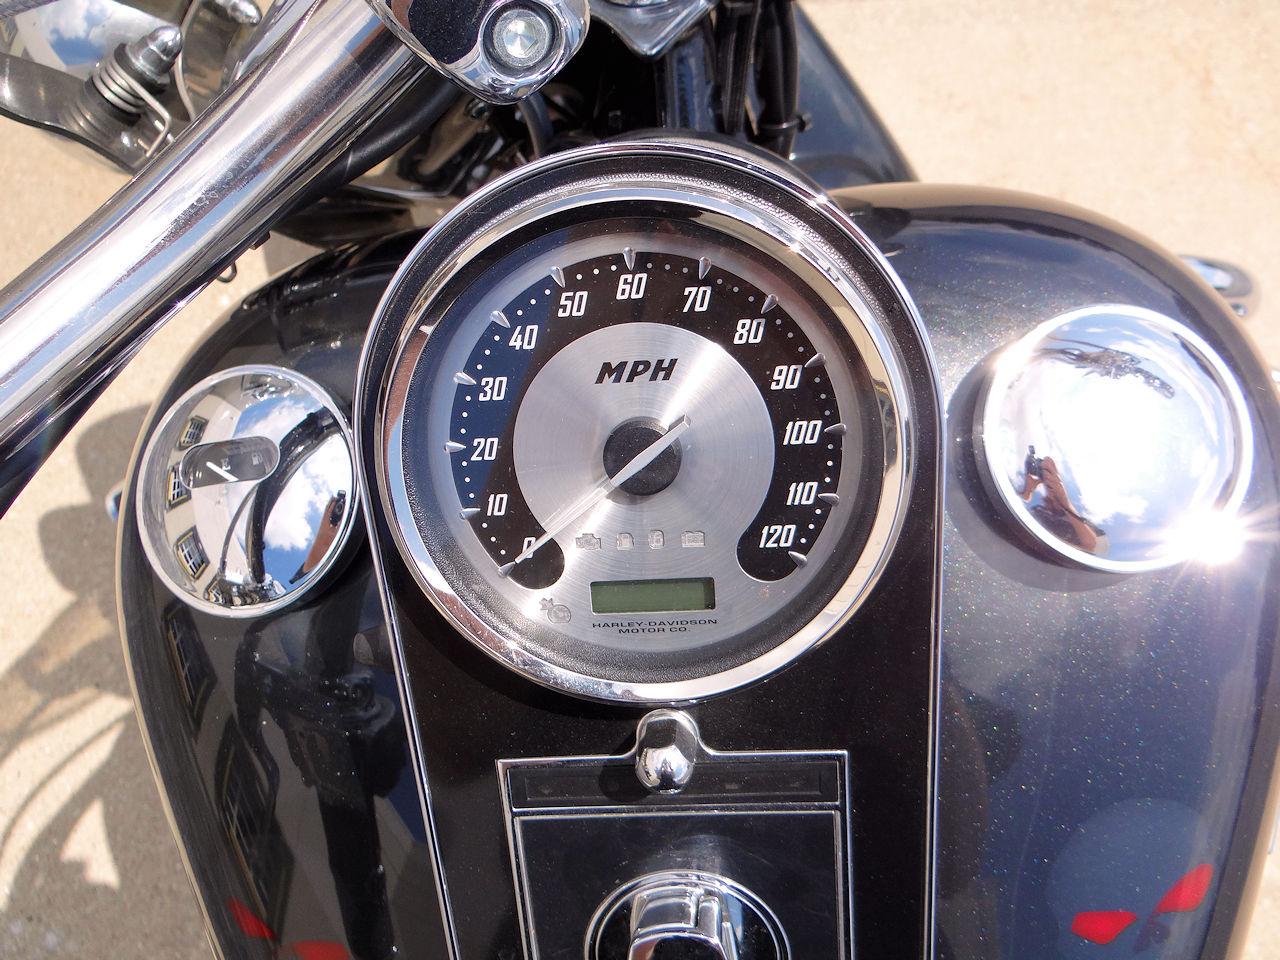 2006 Harley Davidson FLSTNI 12